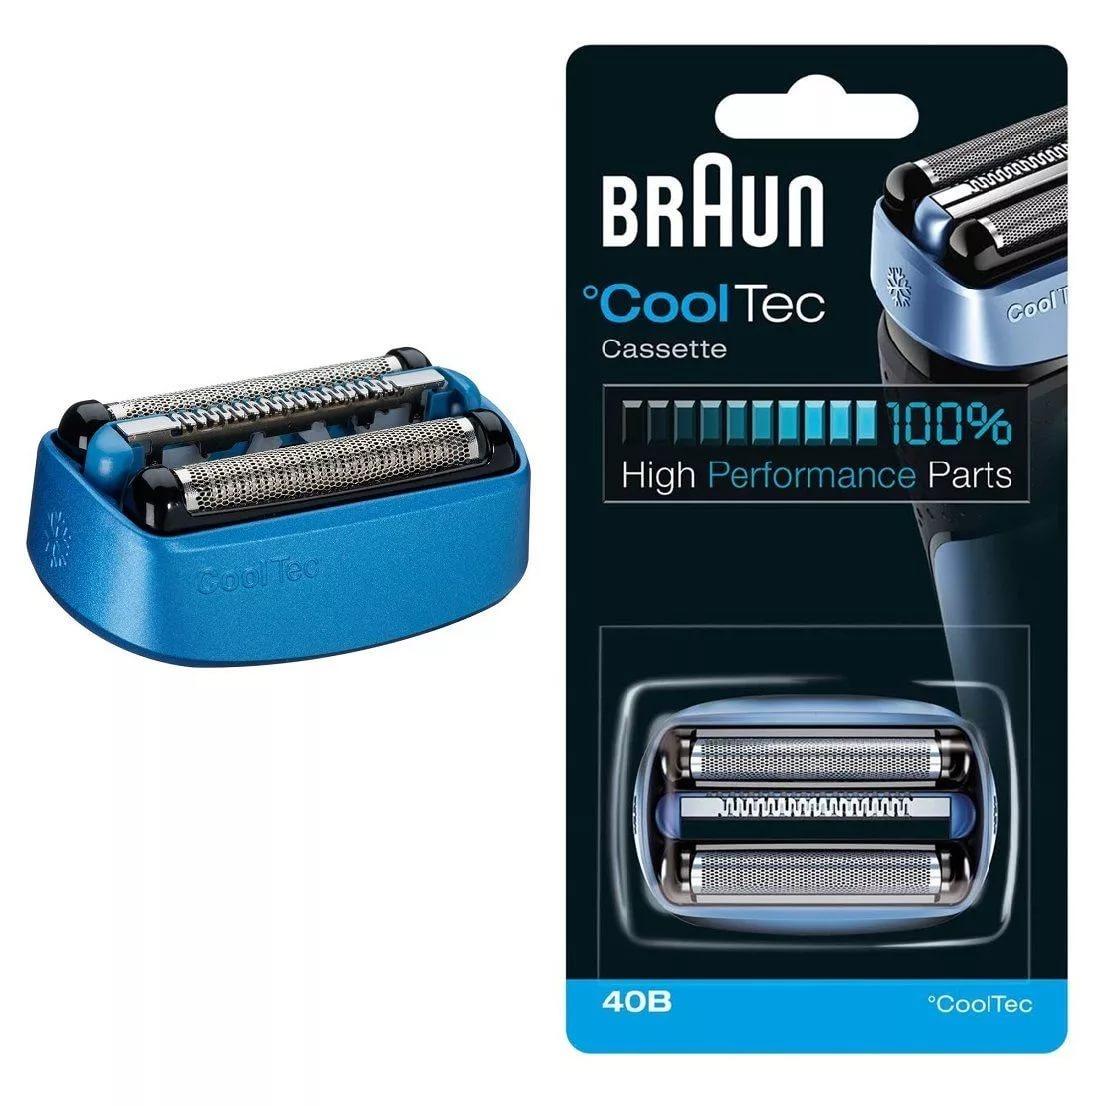 Бритвенная кассета Braun 40B